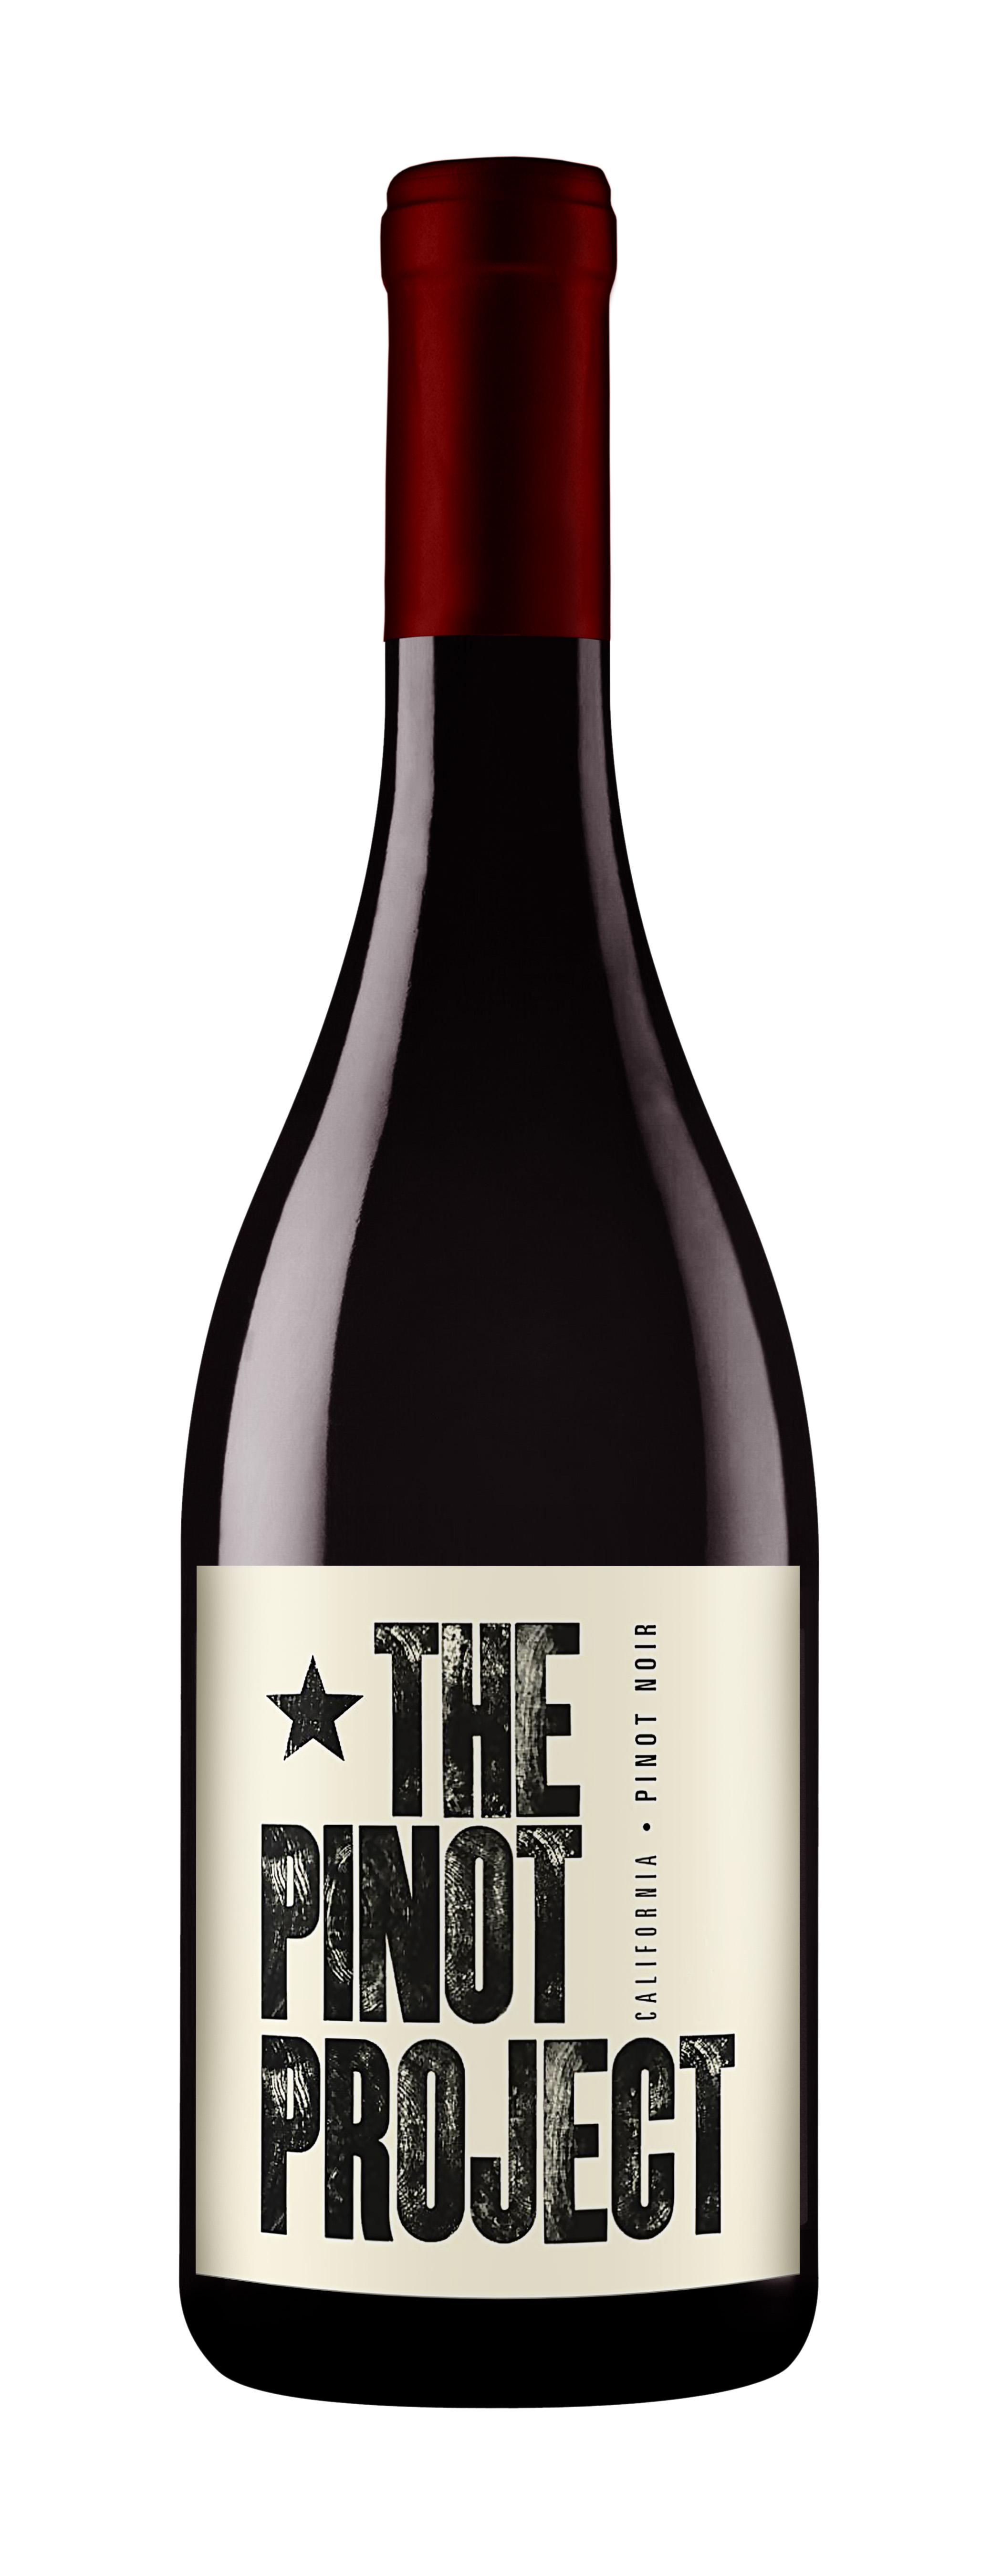 Pinot Noir, 'California', The Pinot ProjectSearchTrade LoginSkurnik Unfiltered CategoriesFollow UsInstagramTwitter FeedContactMORE INFORMATIONSITE NAVIGATIONContactMORE INFORMATIONSITE NAVIGATION